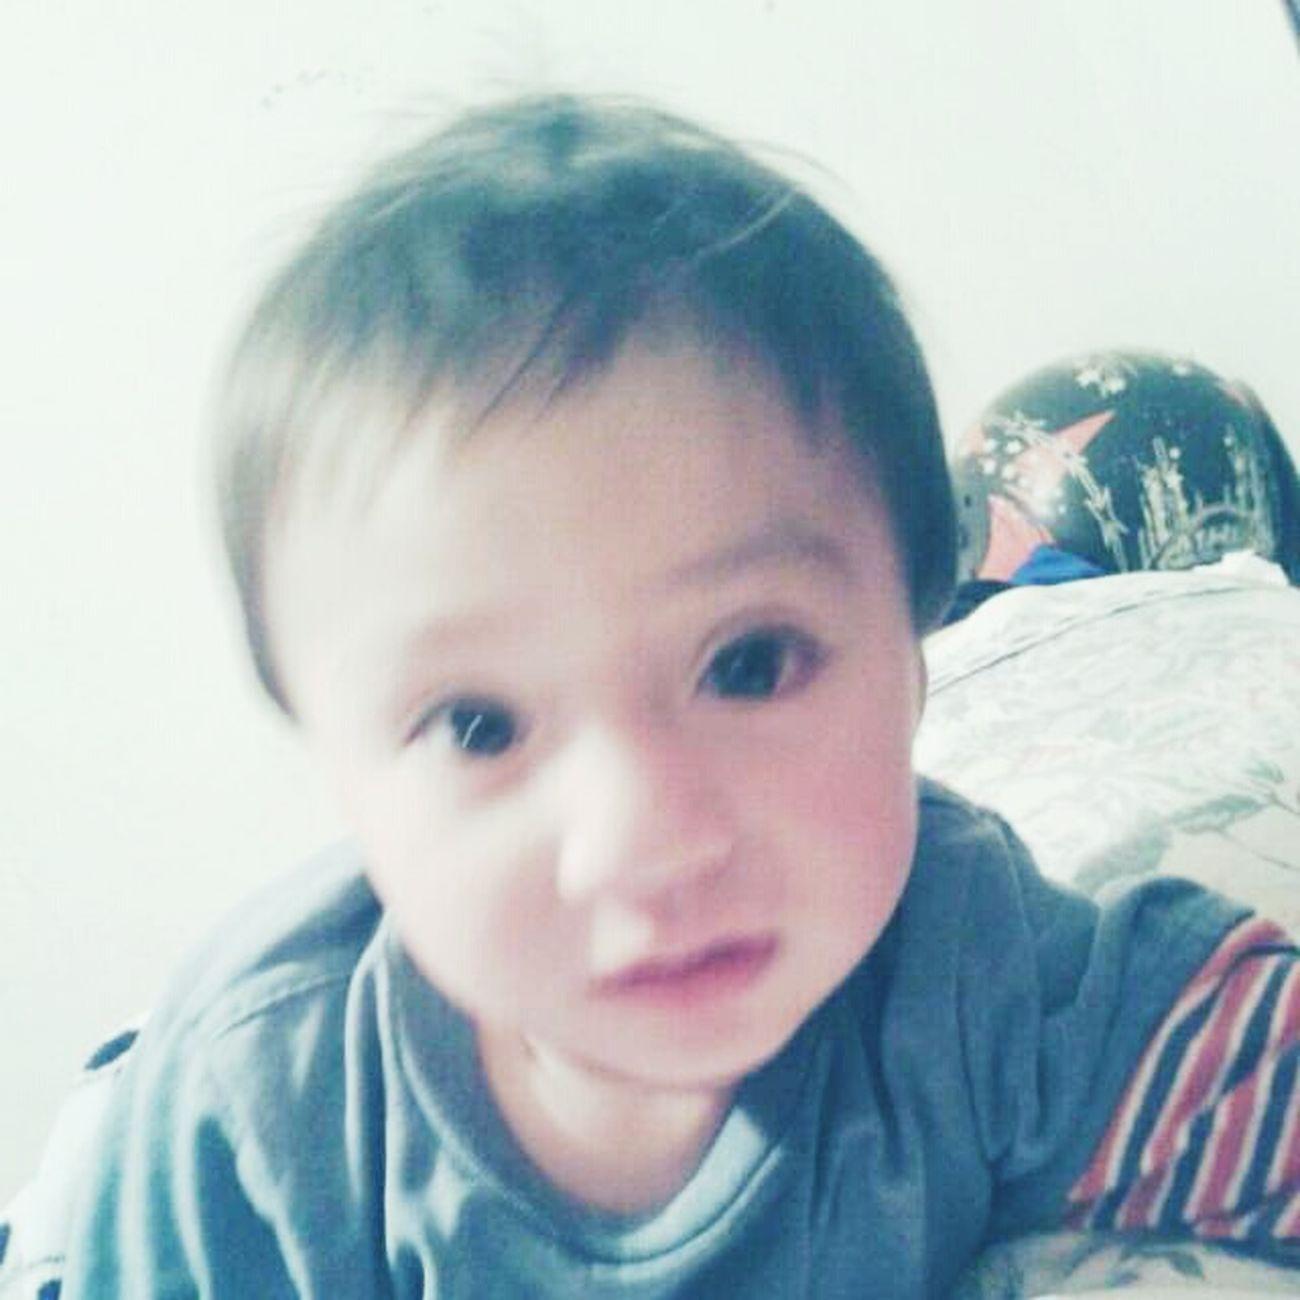 Te quiero muchooo hijito